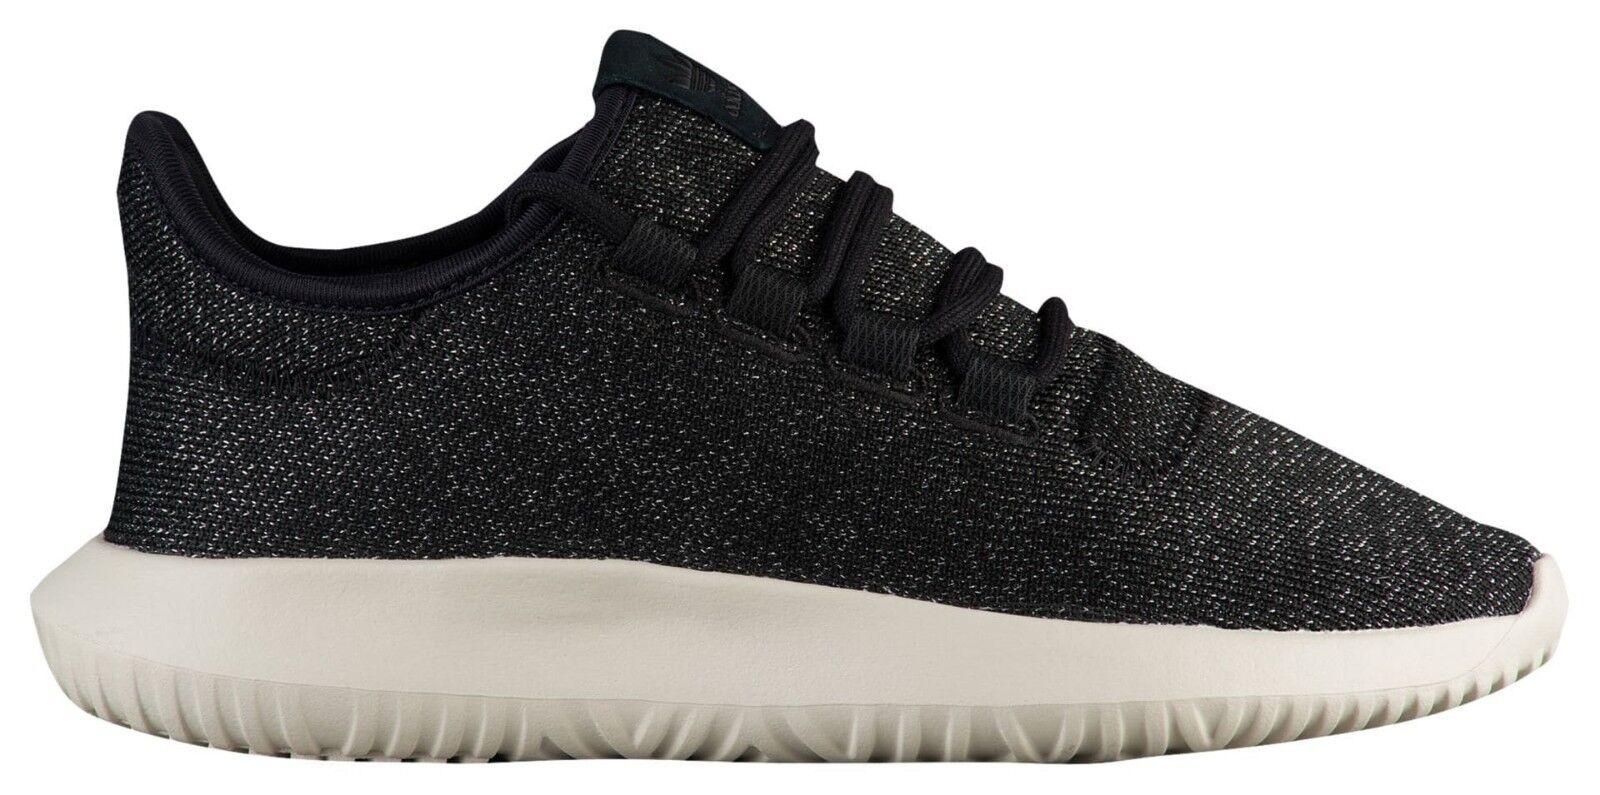 Adidas Originals Women's TUBULAR SHADOW shoes Core Black White AC8028 b